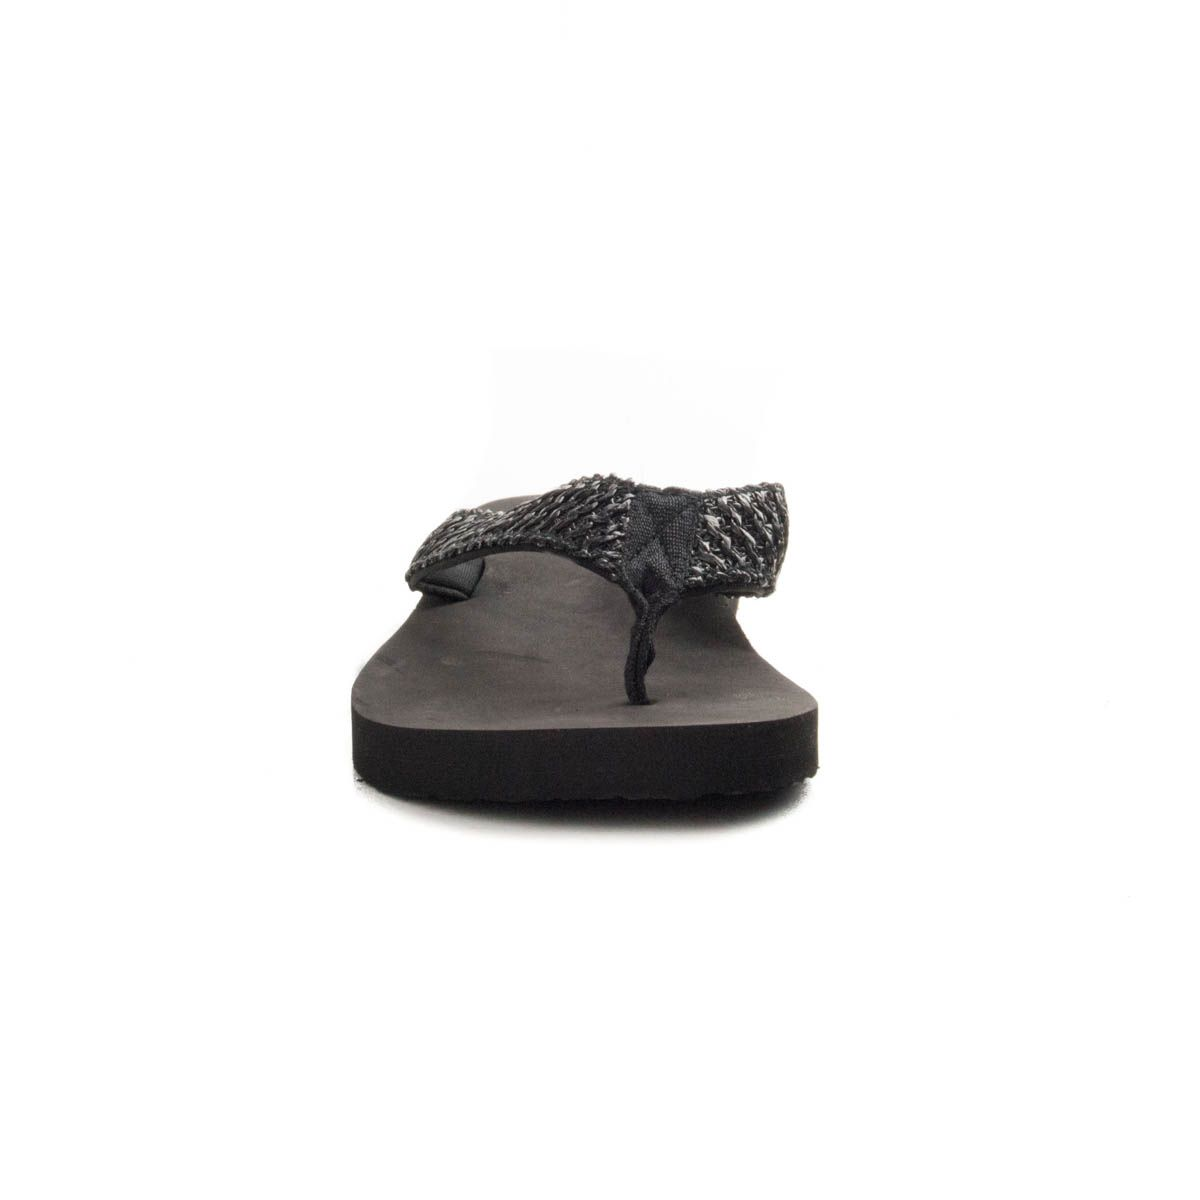 Montevita Woven Flip Flop in Black